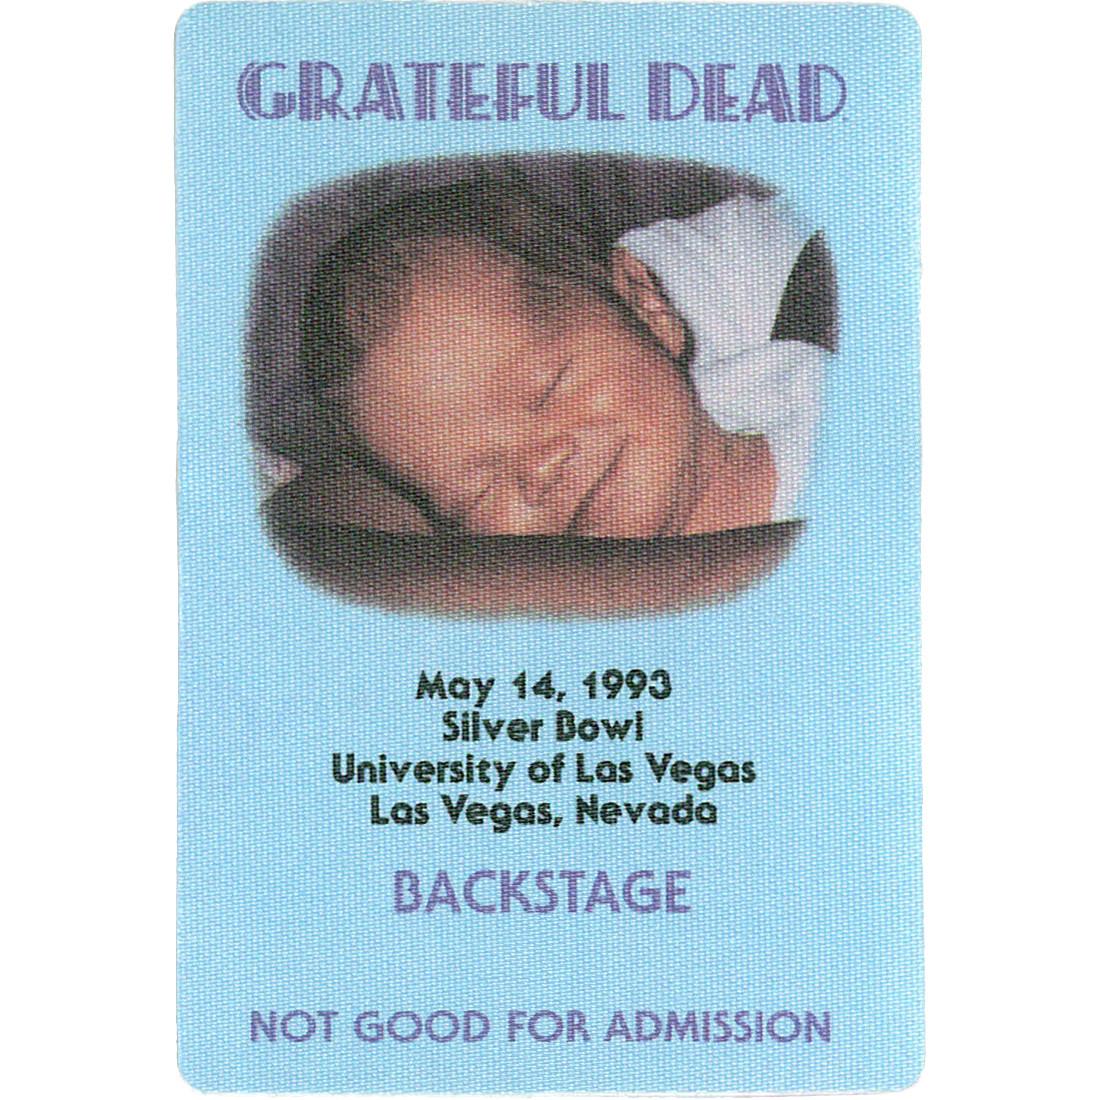 Grateful Dead 1993 05-14 Backstage Pass